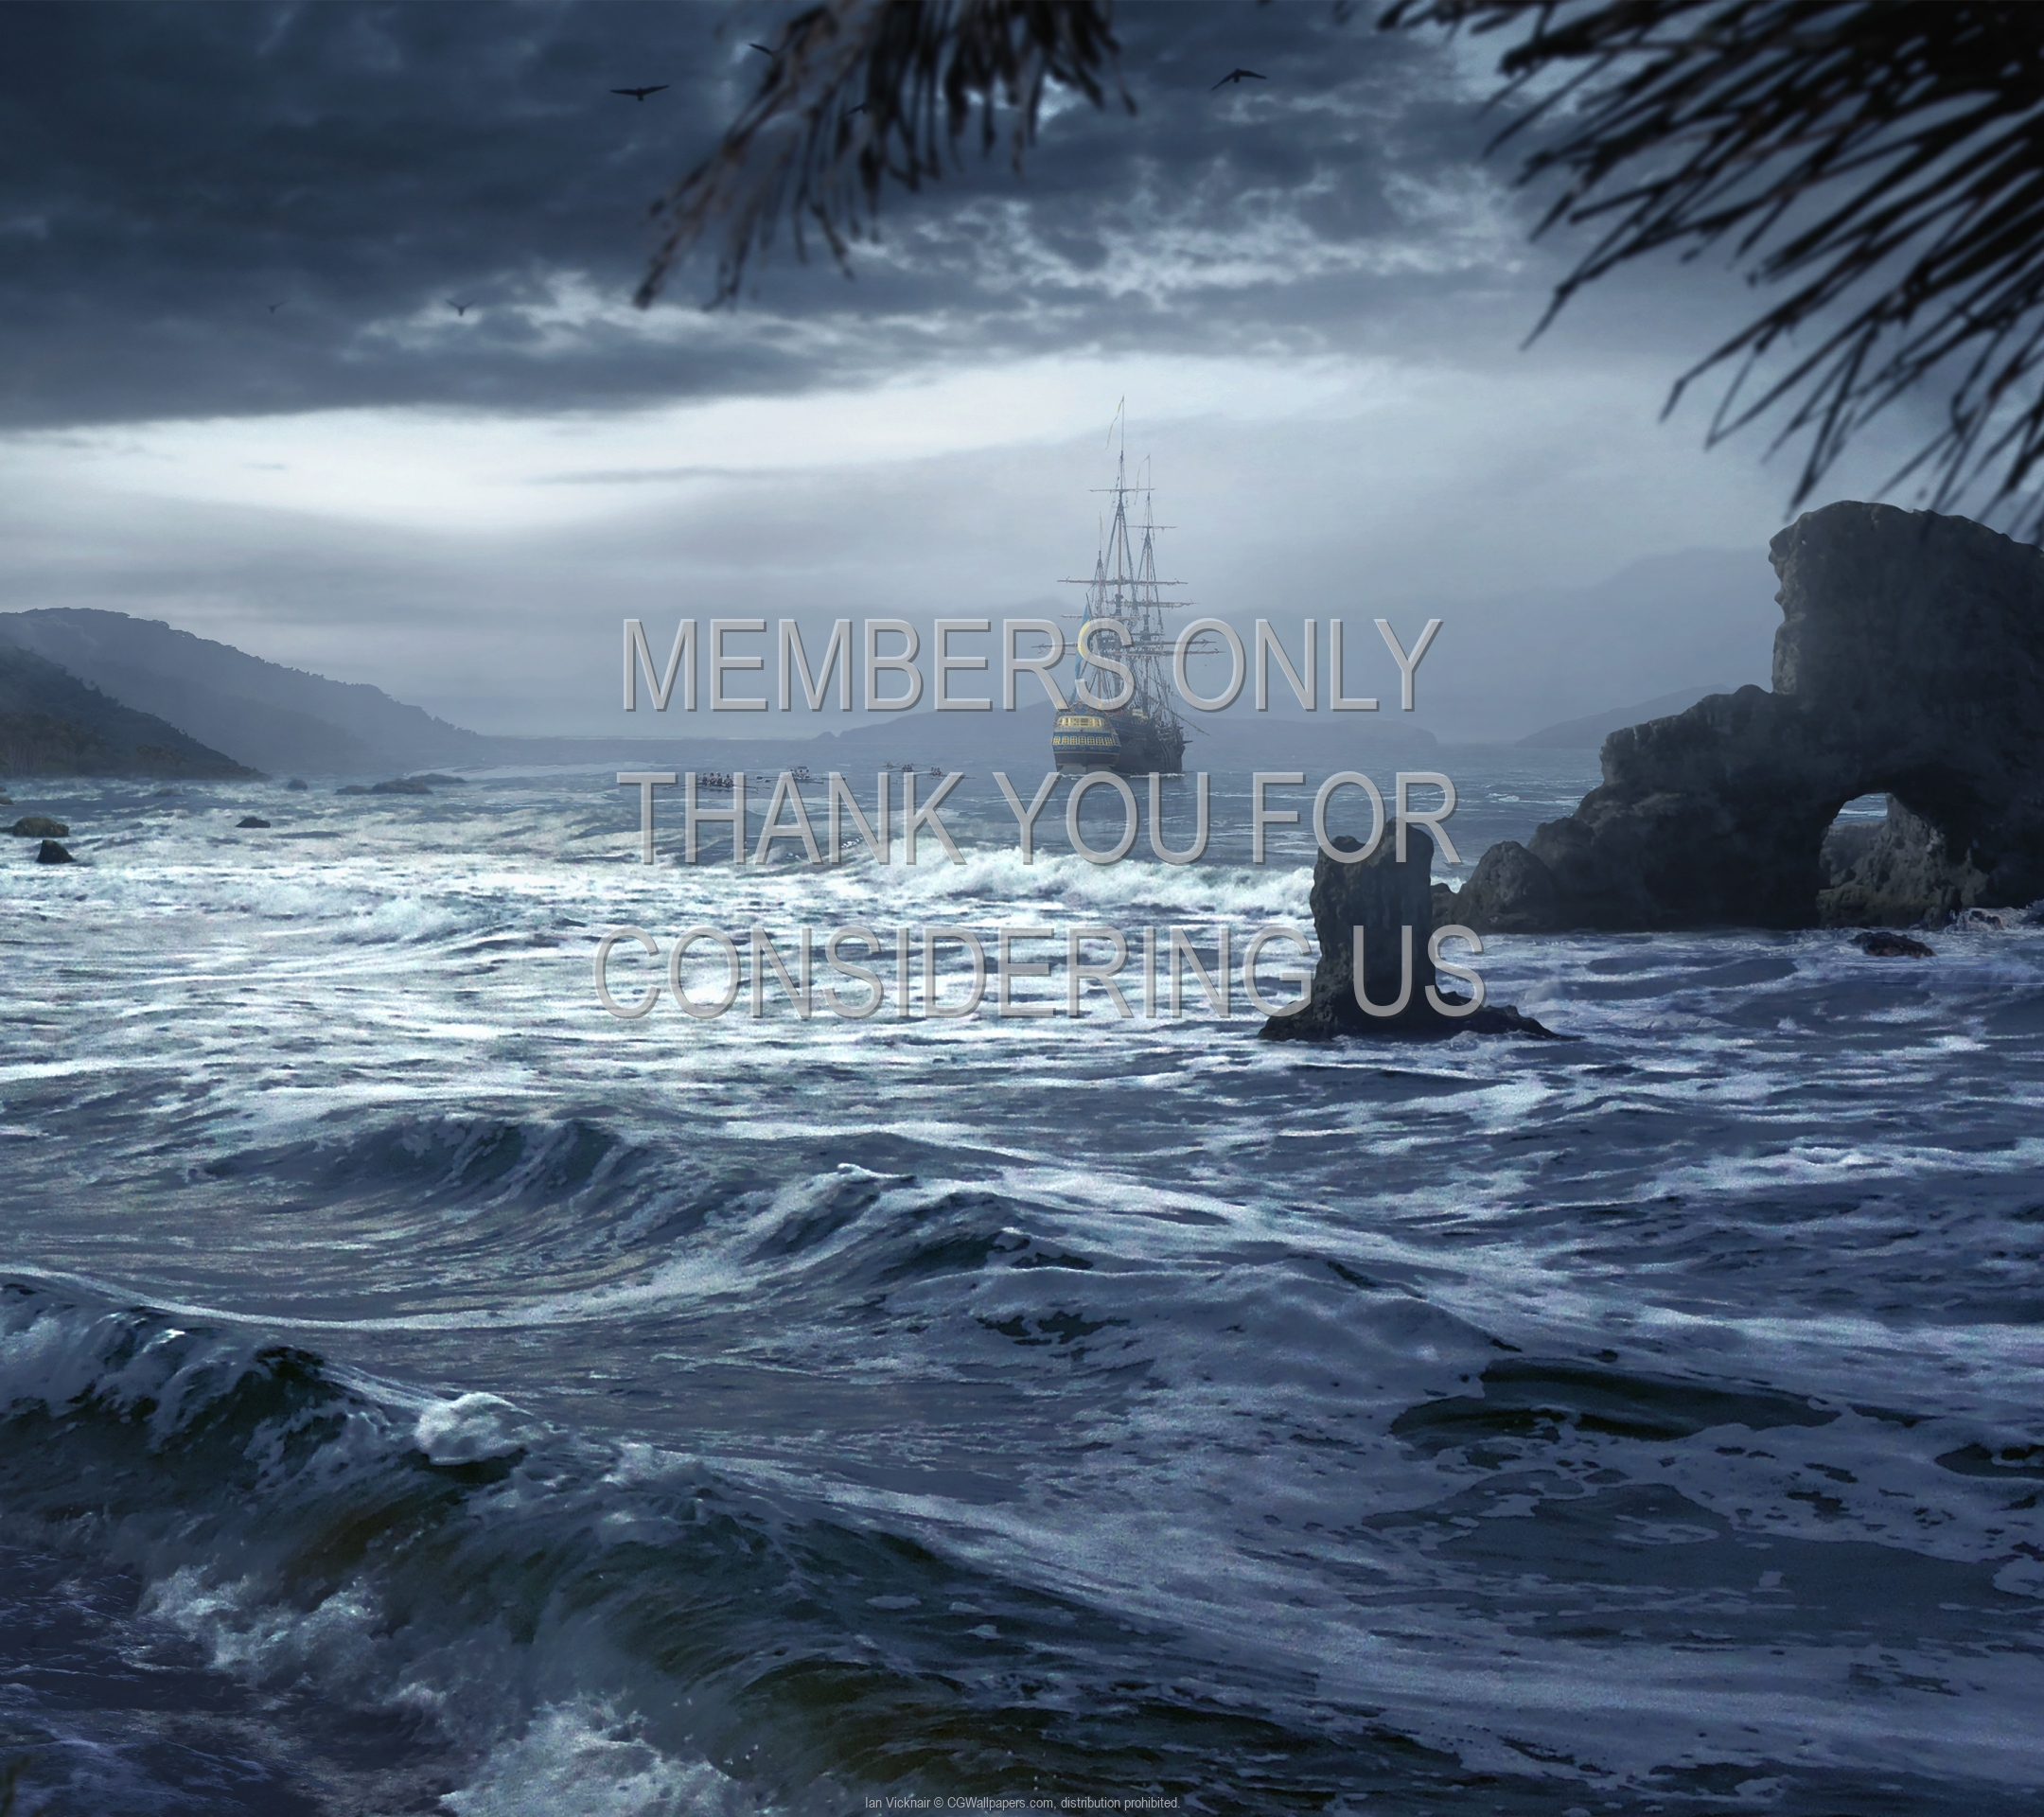 Ian Vicknair 1080p Horizontal Mobile wallpaper or background 01